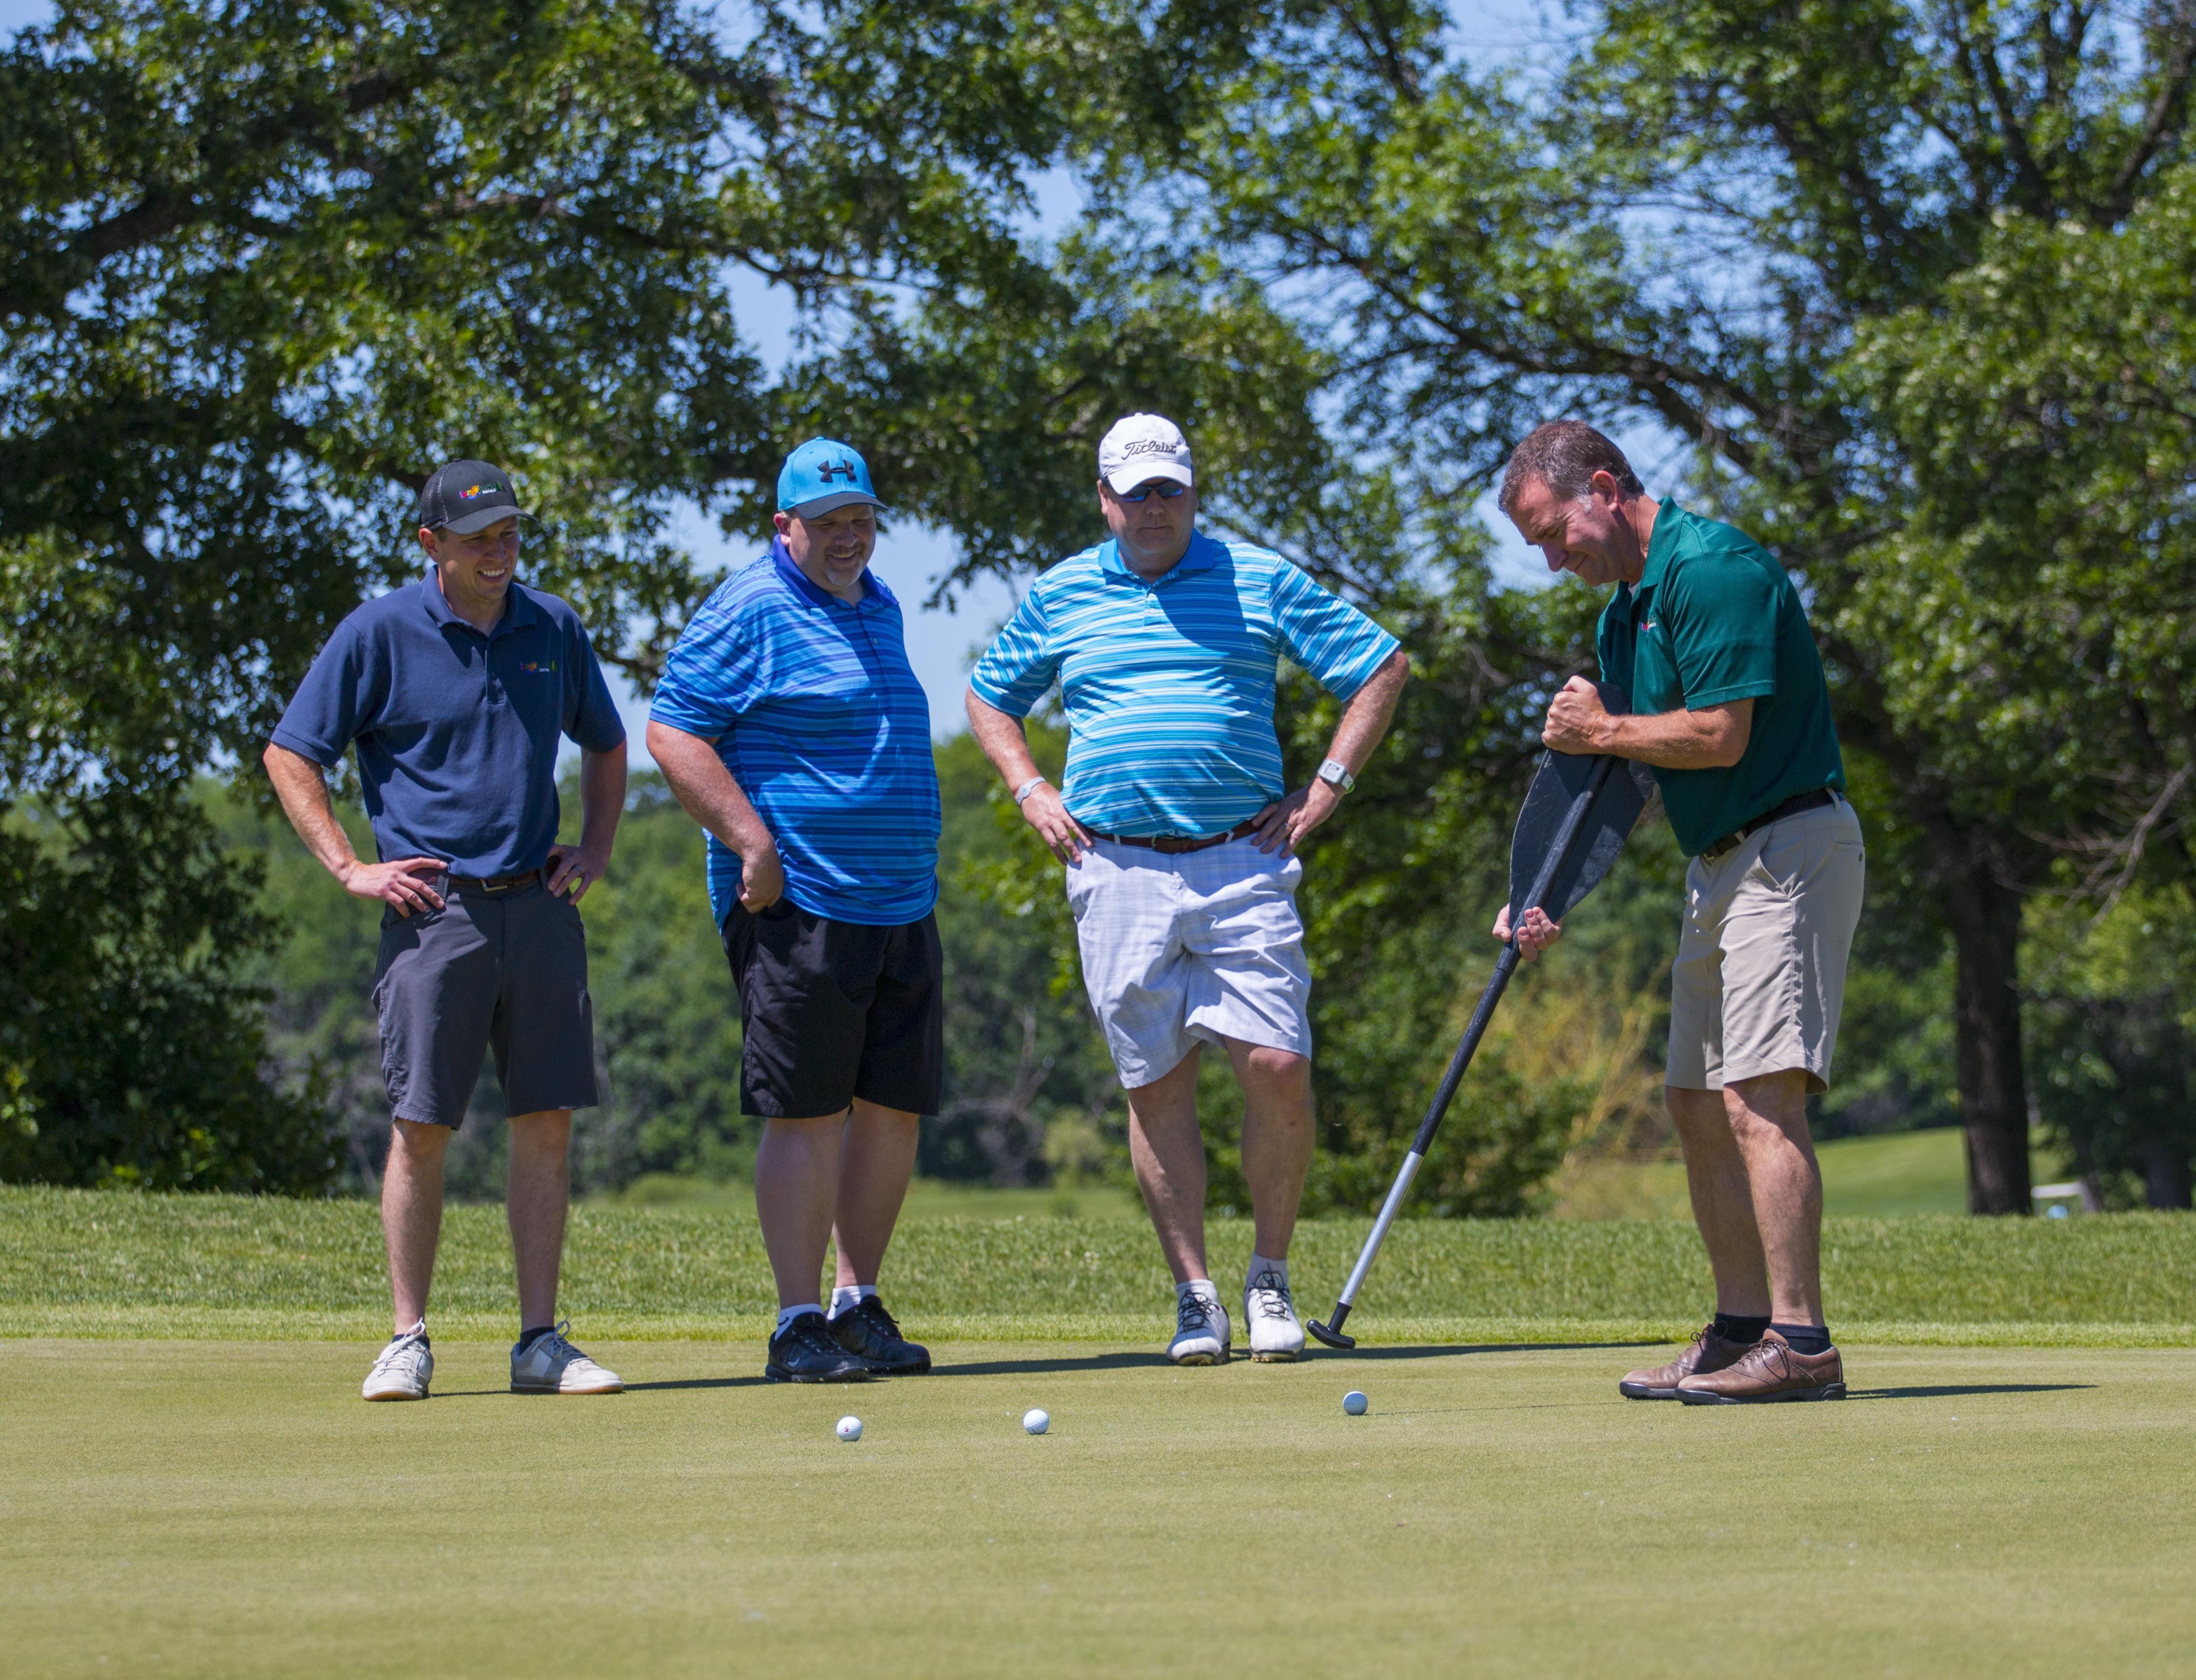 9th Annual Catfish Cup Golf Scramble